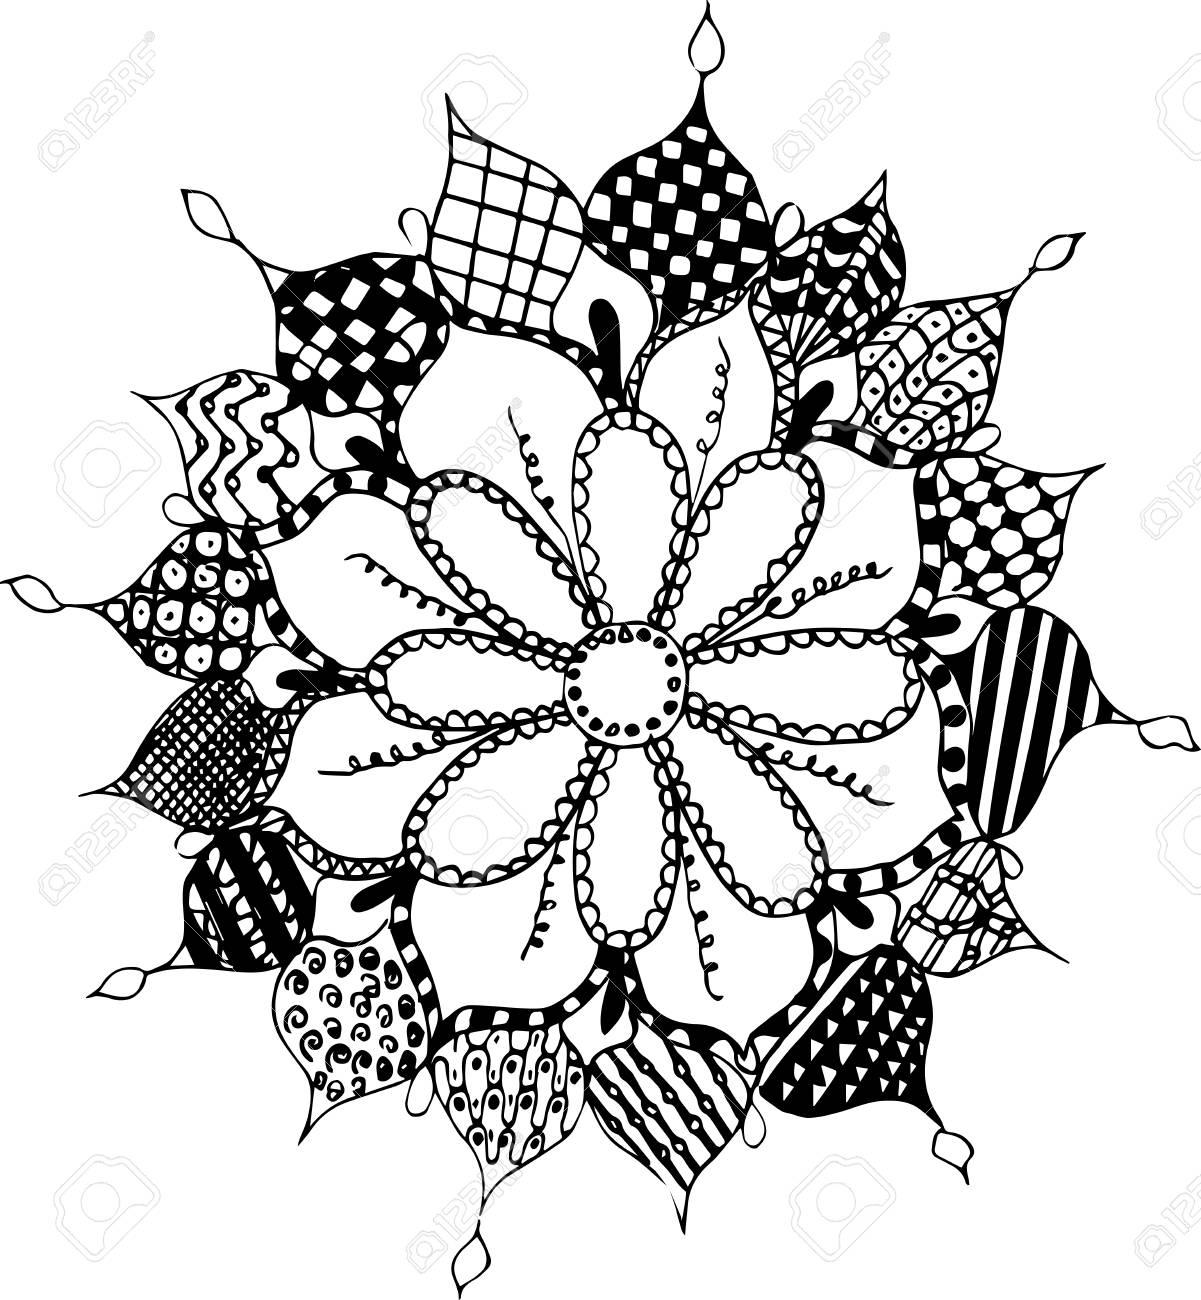 Zentangle flower, pattern, freehand, vector, illustration. Print..